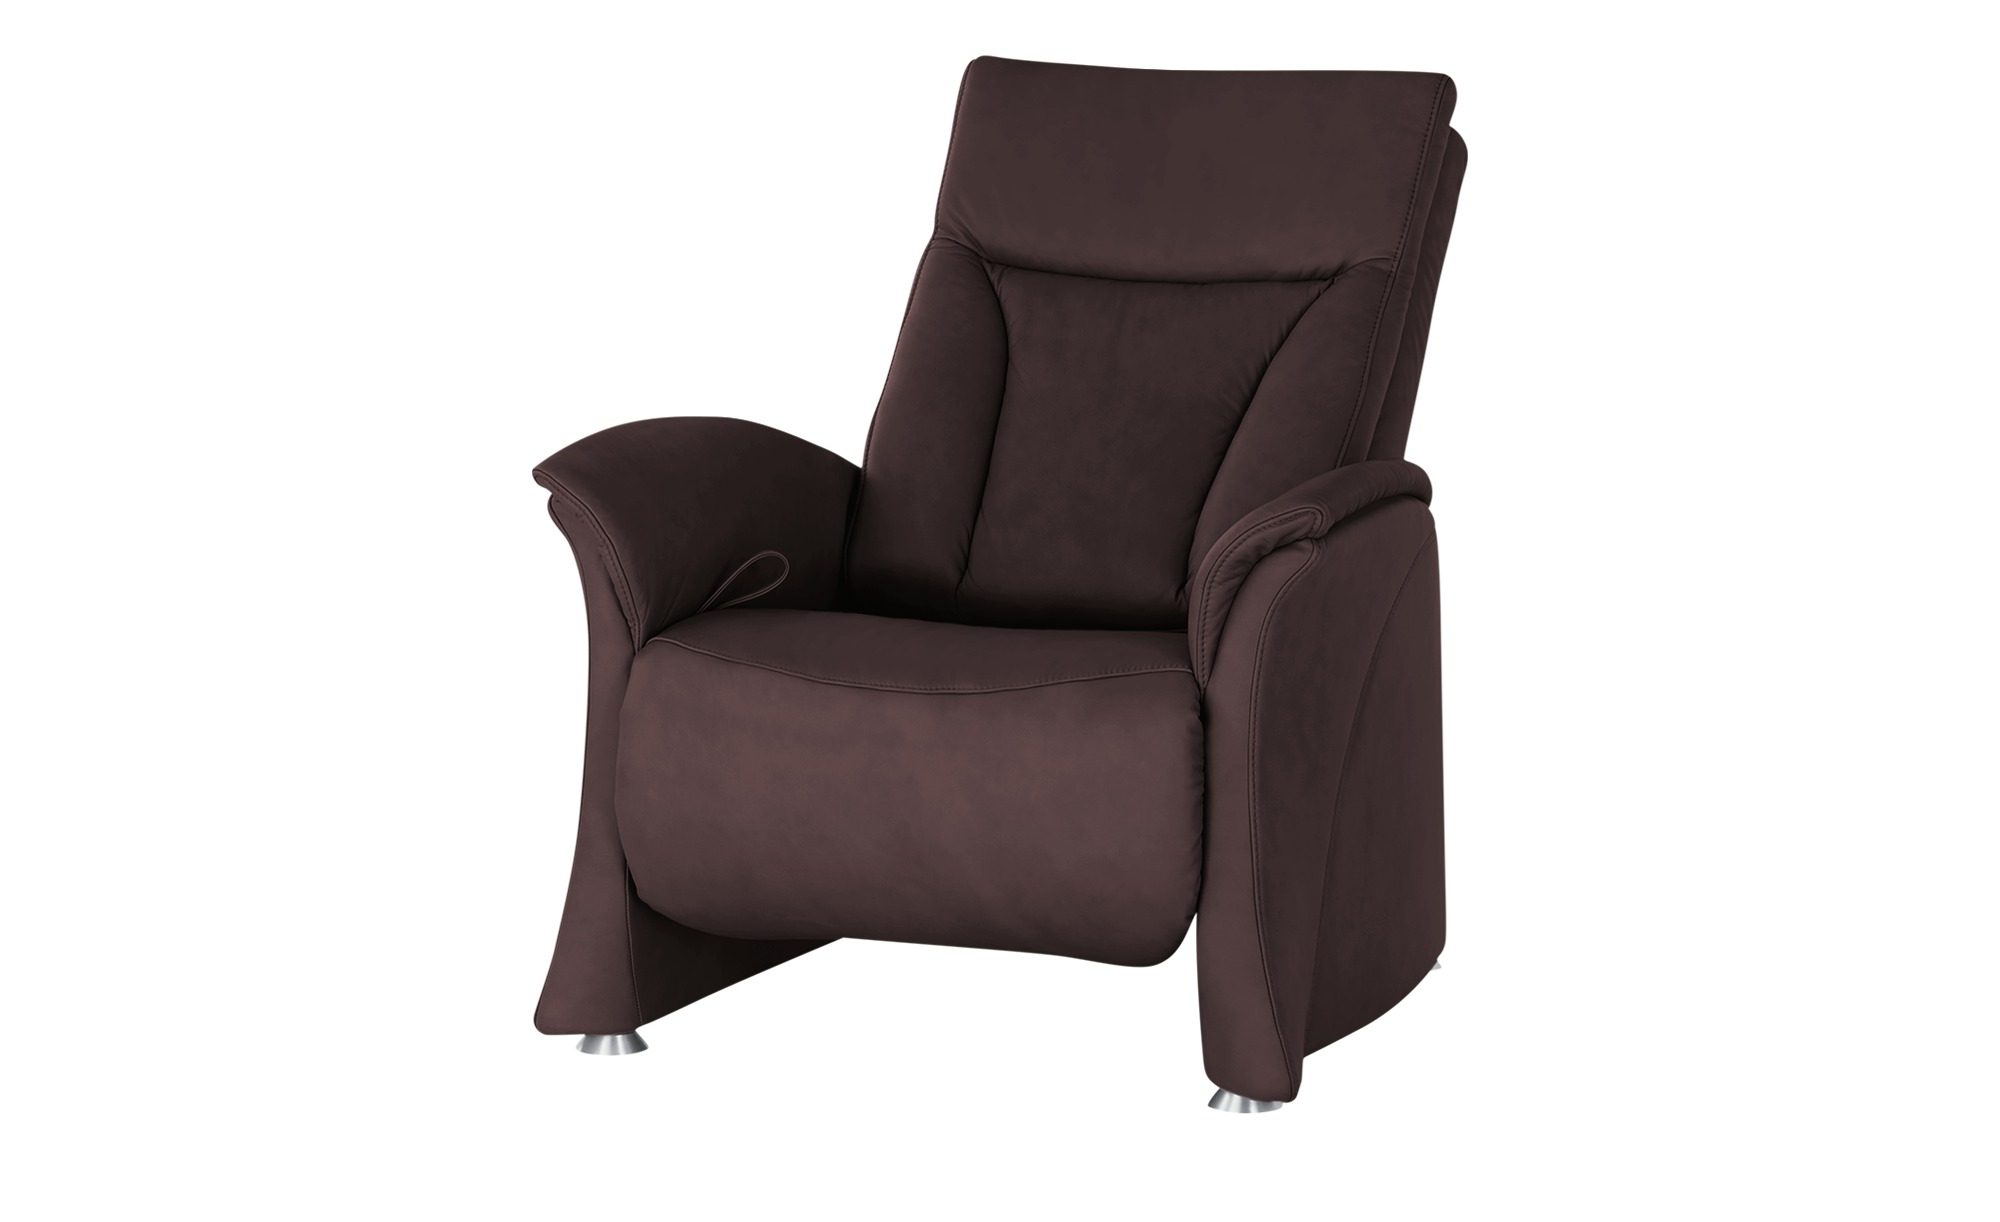 himolla Sessel mit Relaxfunktion  4010 ¦ rot ¦ Maße (cm): B: 87 H: 108 T: 88 Polstermöbel > Sessel > Ledersessel - Höffner